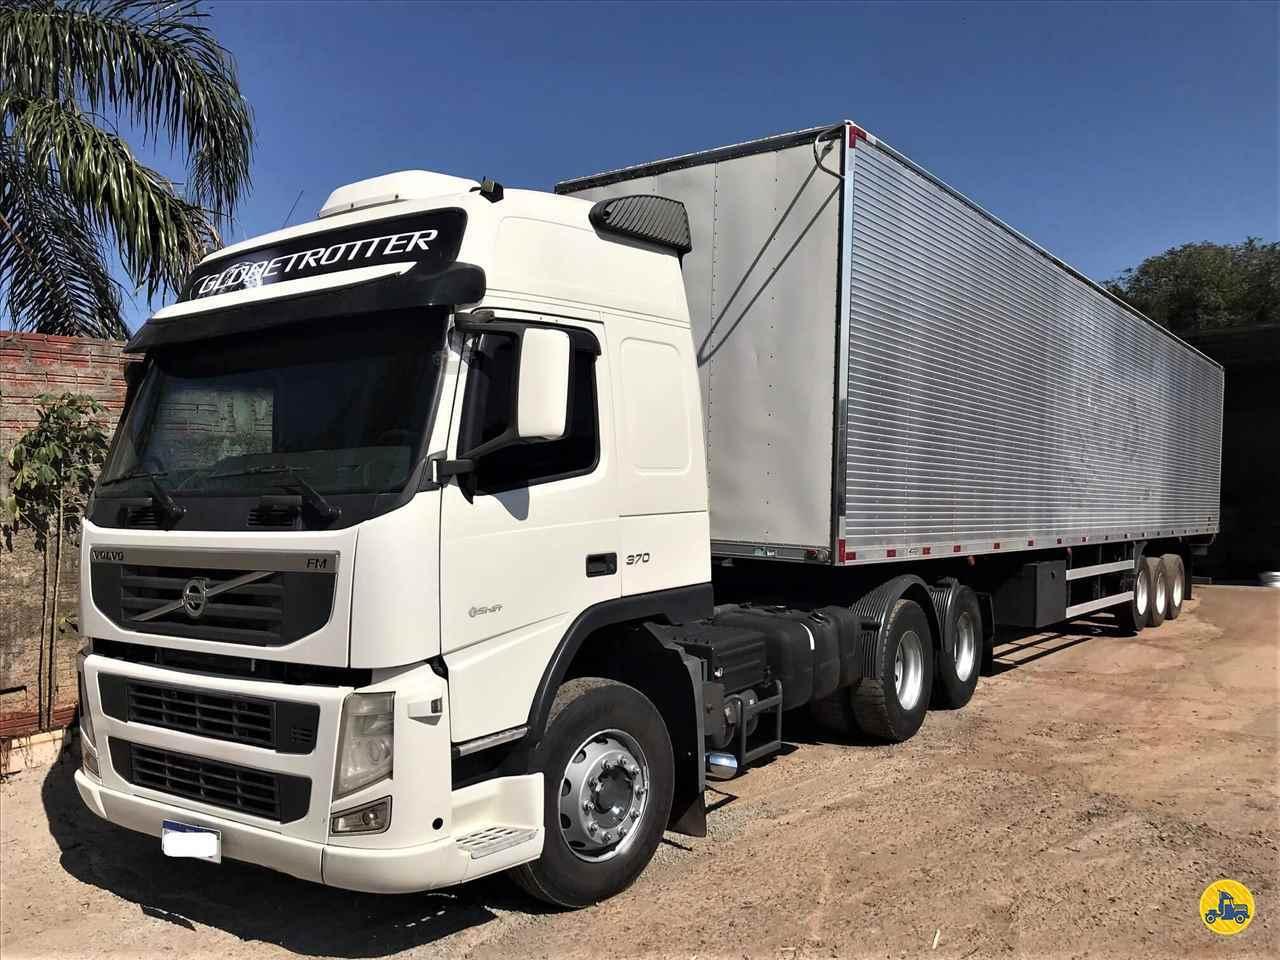 CAMINHAO VOLVO VOLVO FM 370 Cavalo Mecânico Truck 6x2 JK Caminhões PR SARANDI PARANÁ PR